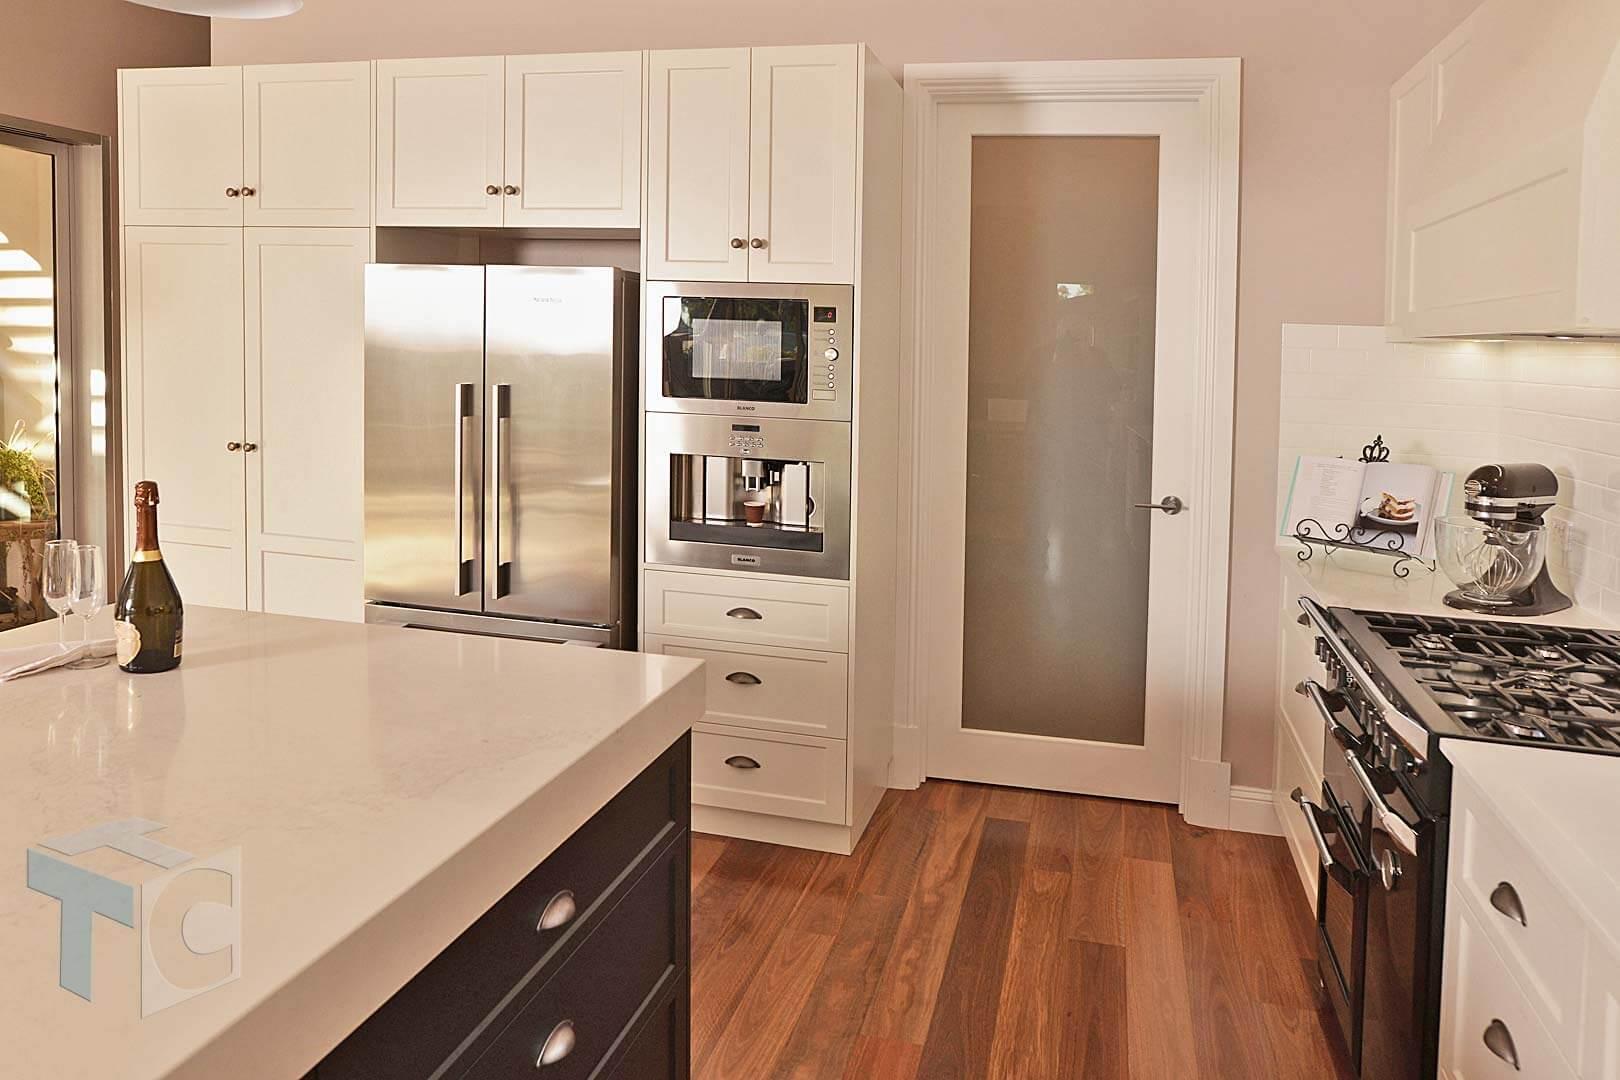 Kitchen modern contemporary style 03